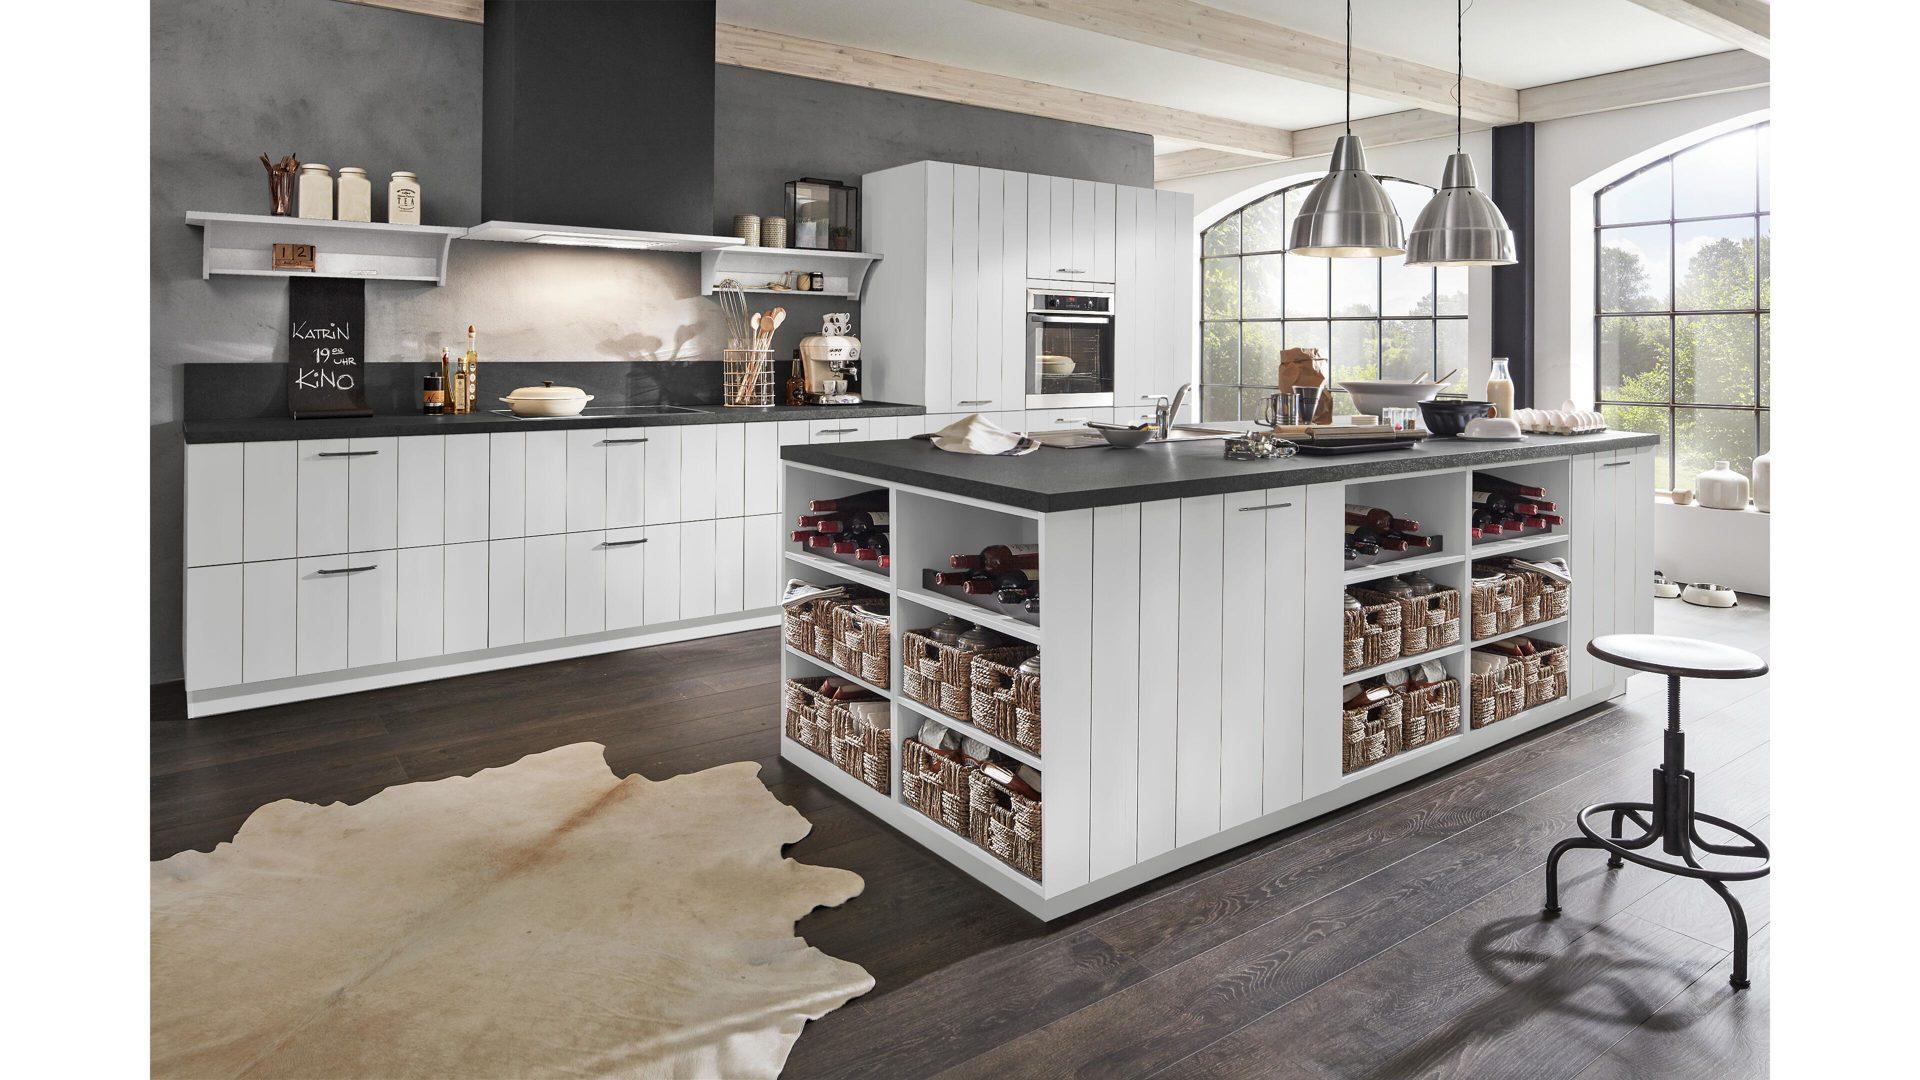 Möbel Boer Coesfeld, Möbel A-Z, Küchen, Culineo, Einbauküche